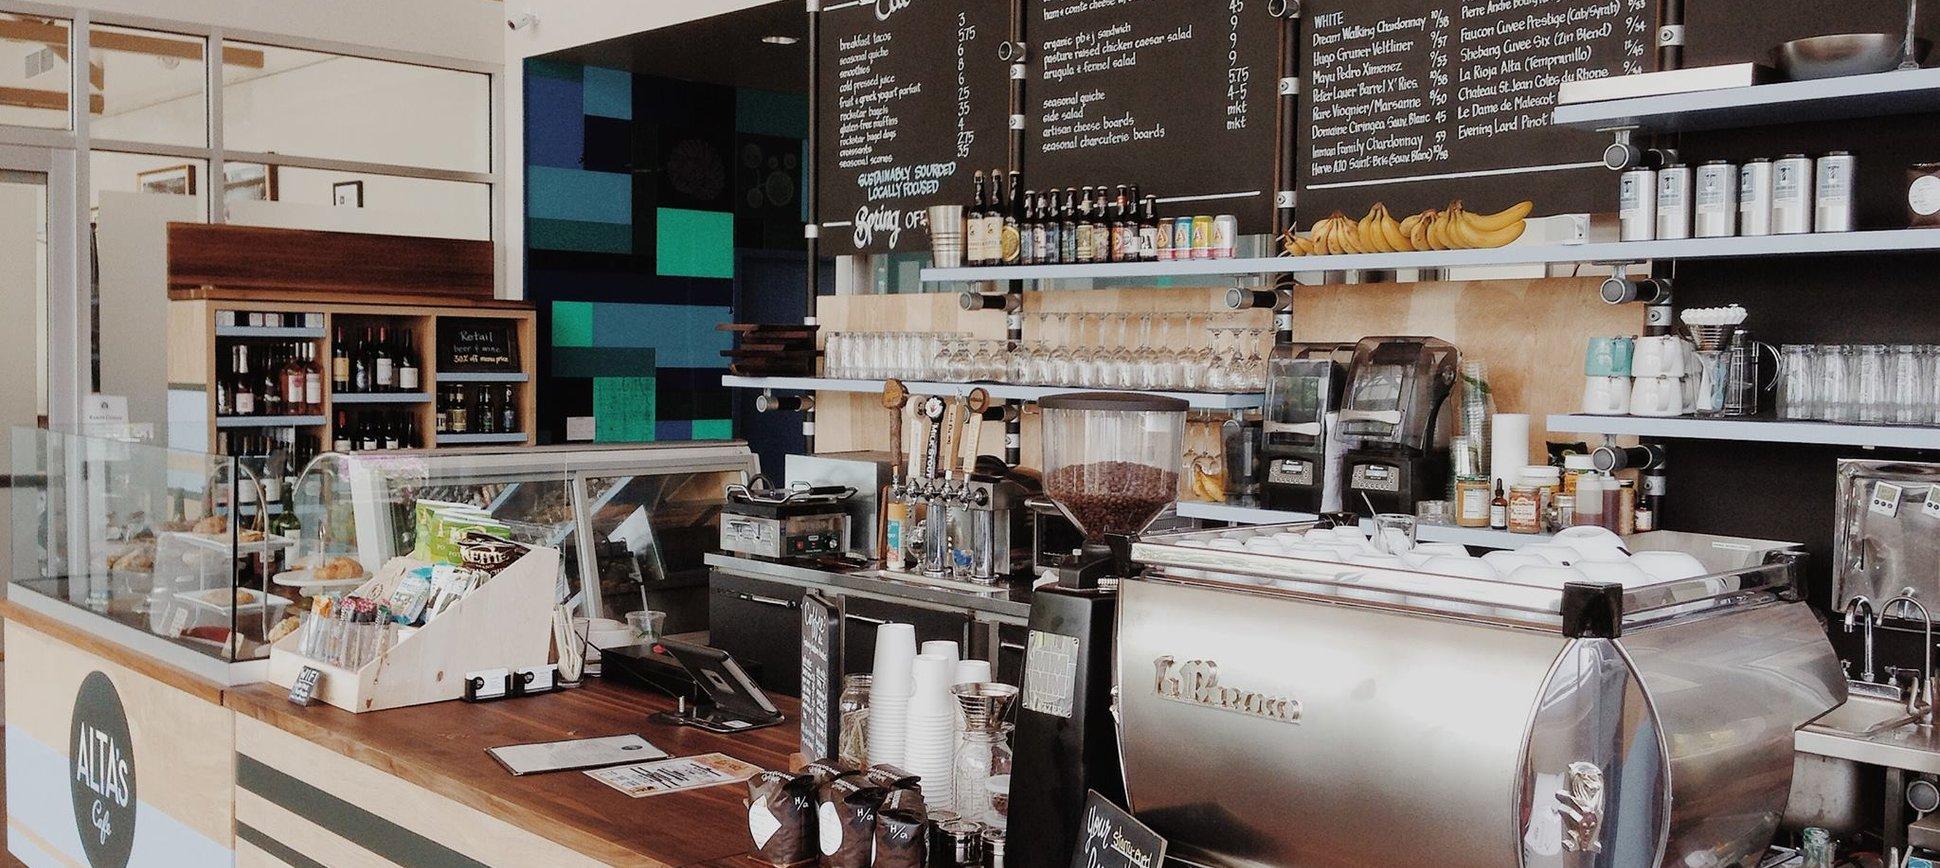 The Best Hidden-Gem Restaurants in Austin